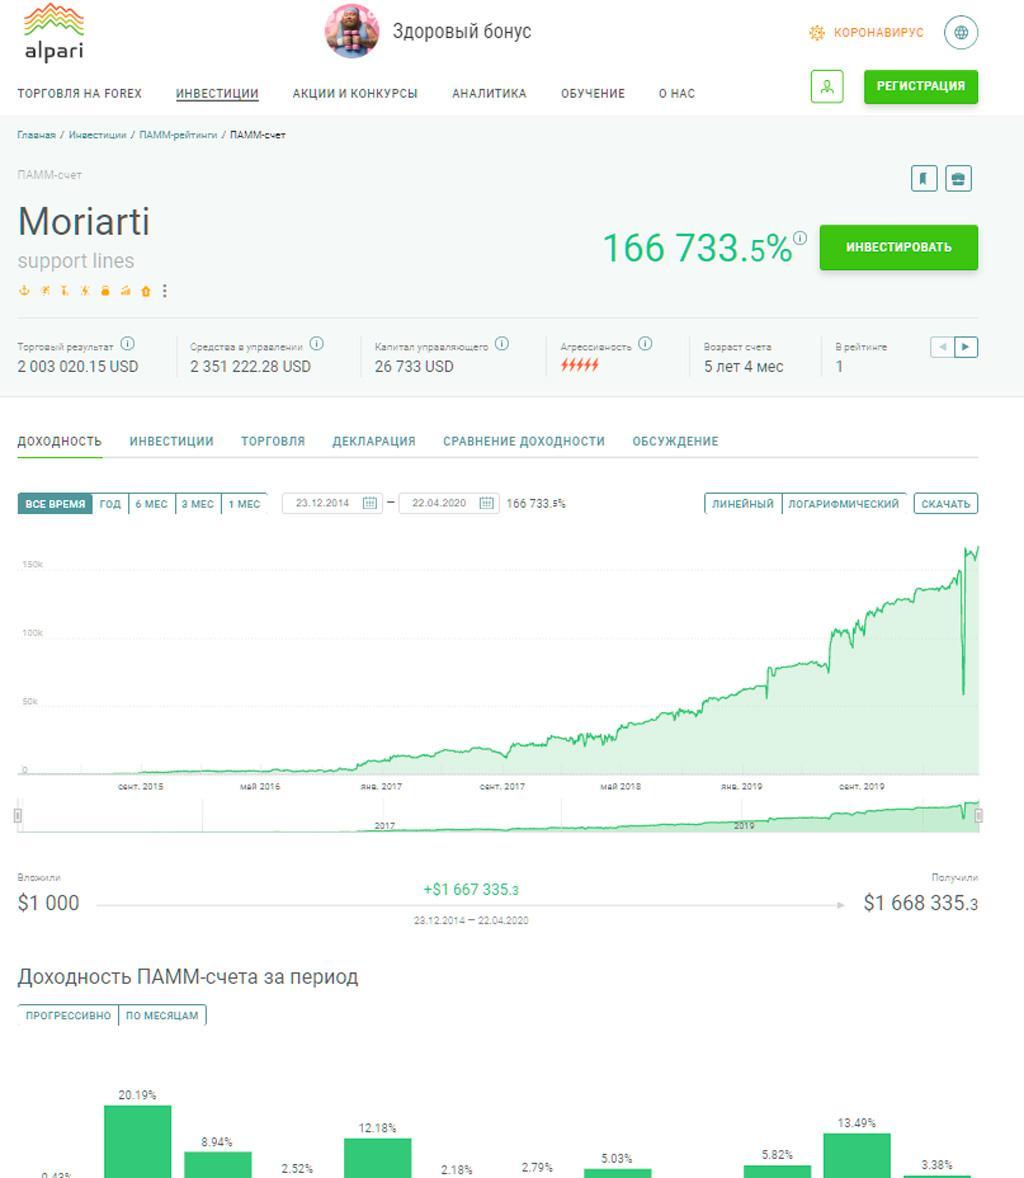 Статистика и график доходности по счету Moriarti с сайта Alpari